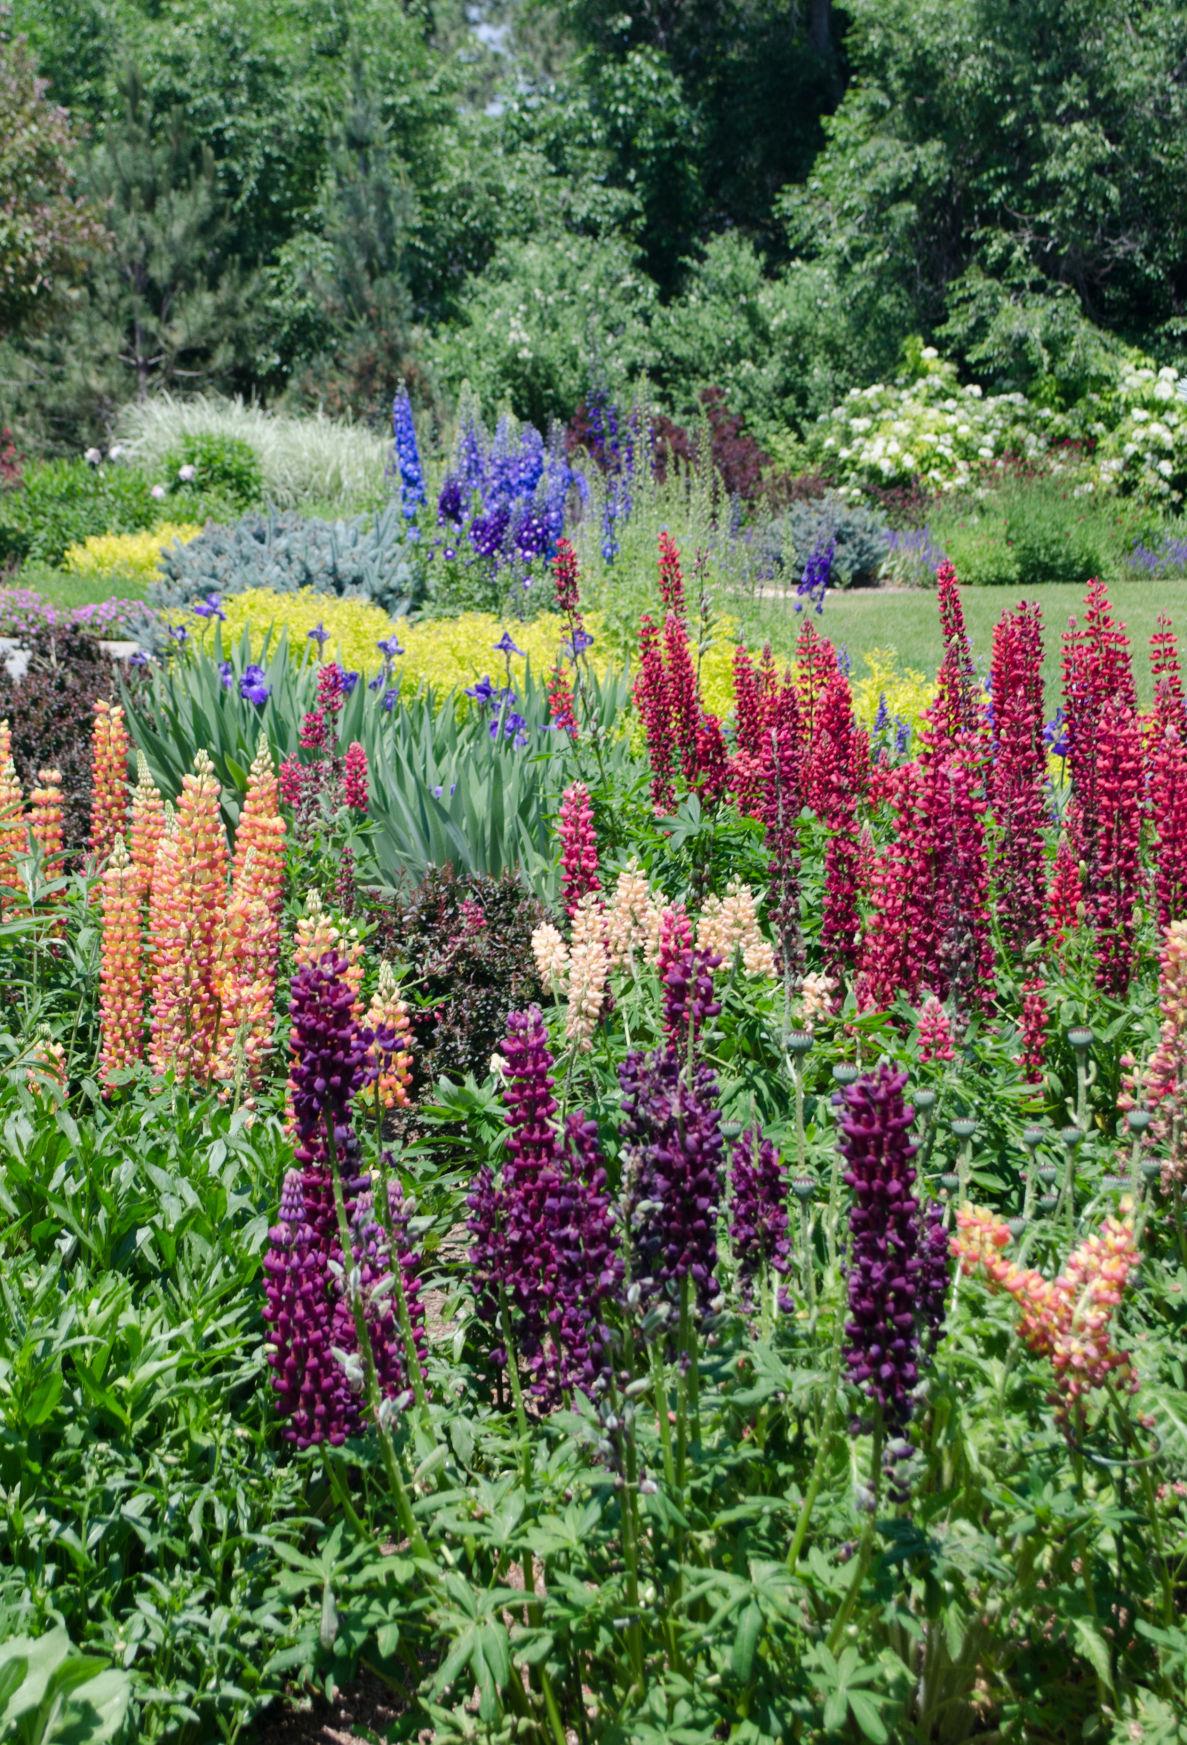 FOX Tour To Show Off 7 Broadmoor Area Gardens